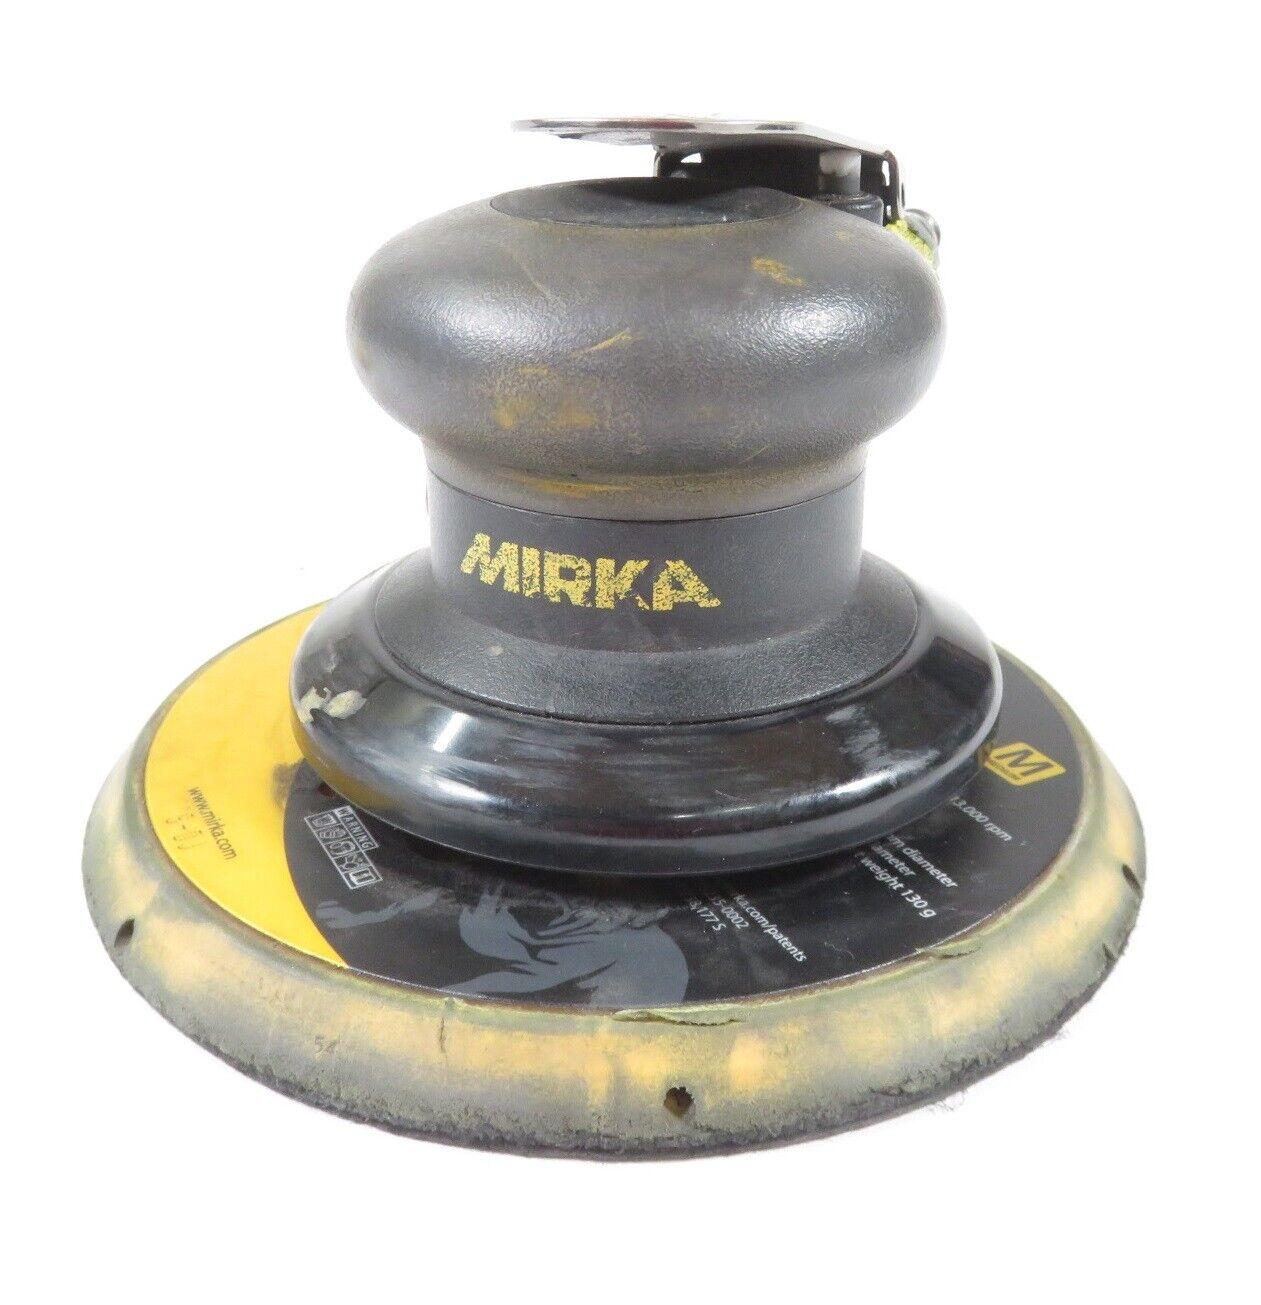 Mirka MR-508 Finishing 8mm Orbit Sander - Handheld, Pneumatic, 12,000 RPM. Buy it now for 107.97